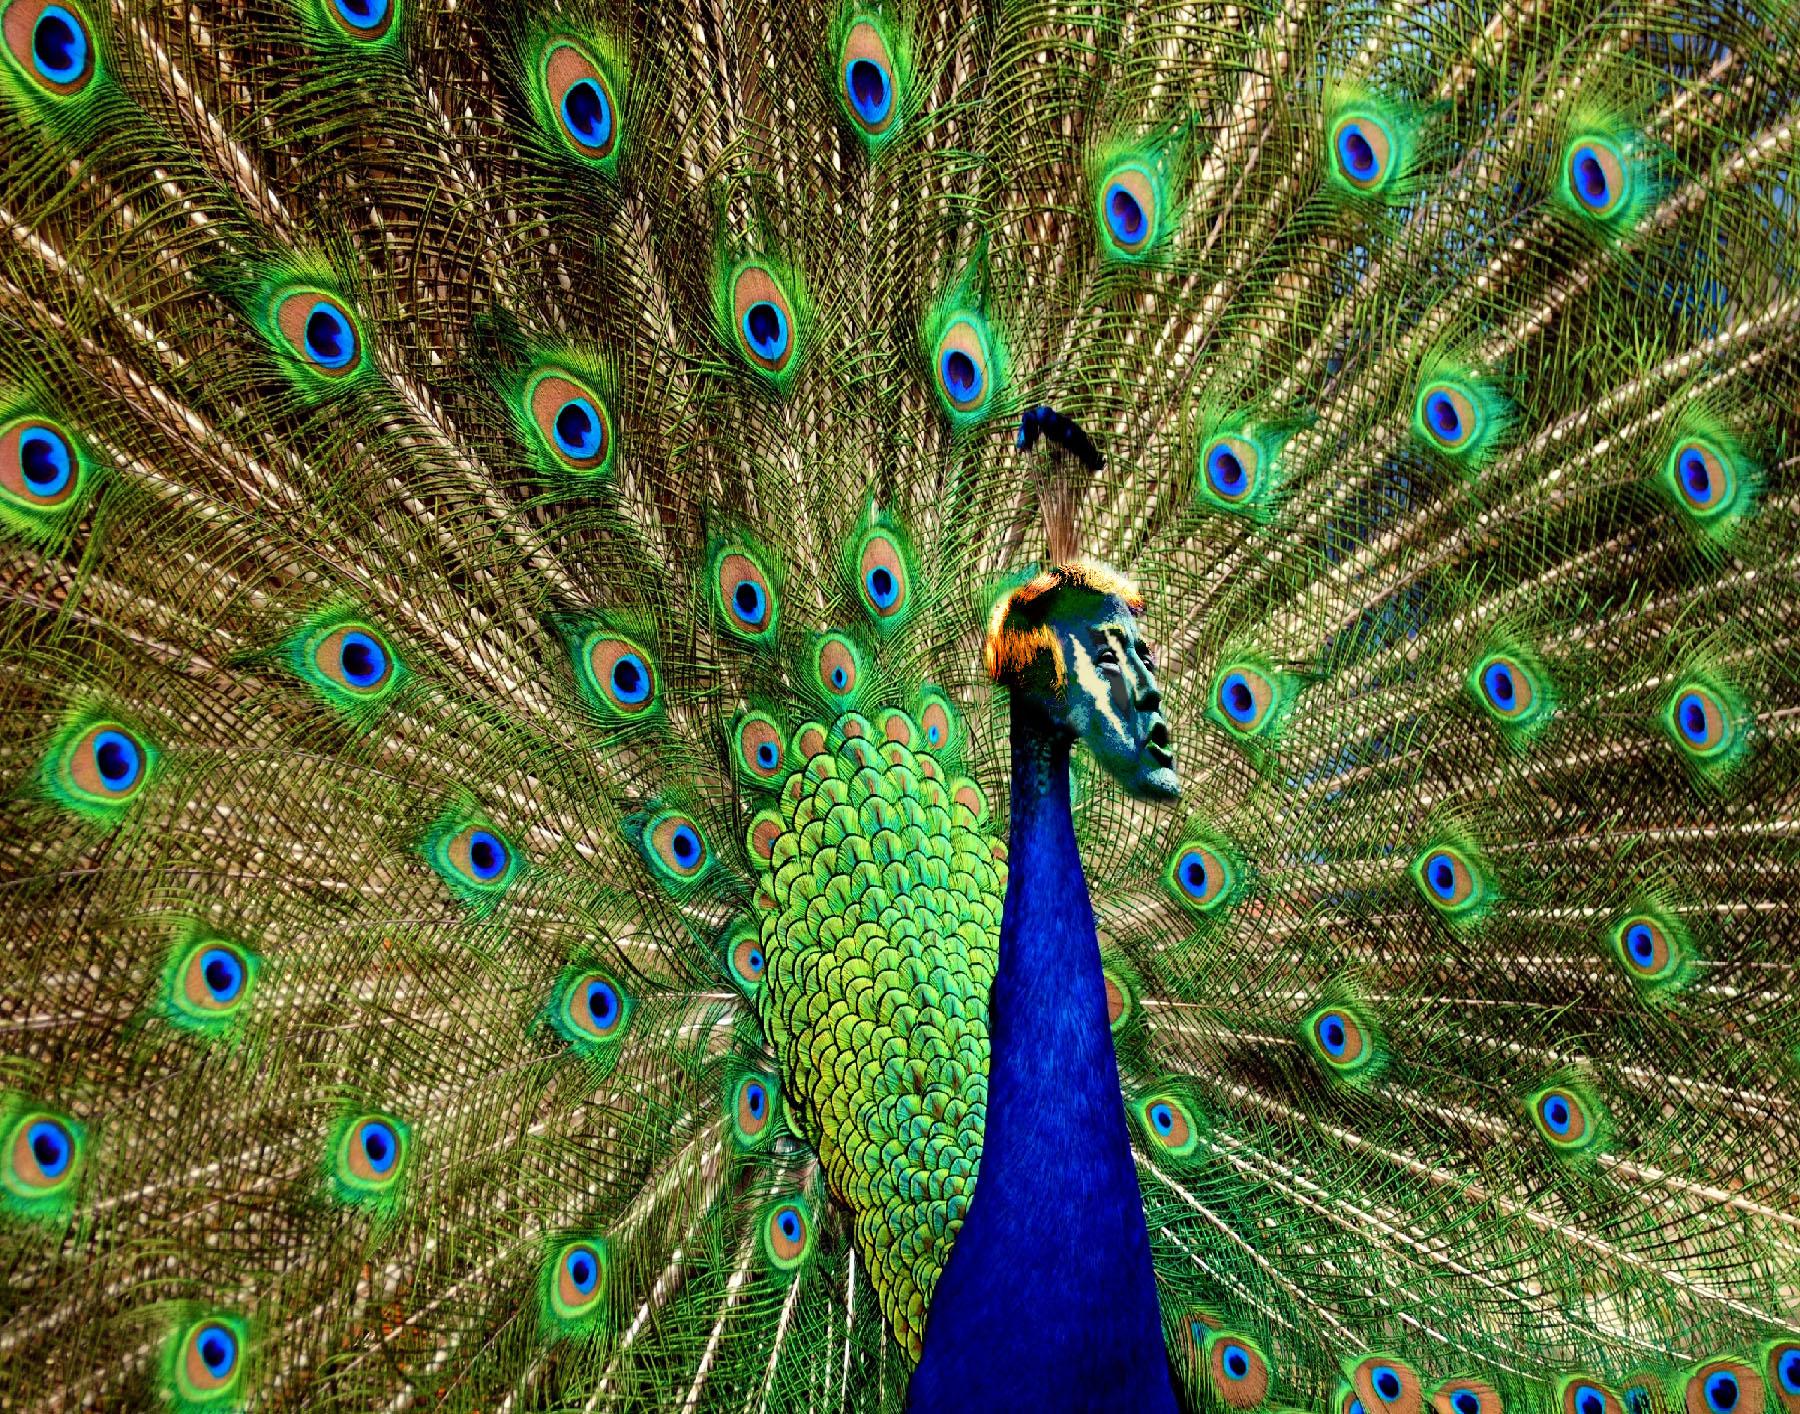 Trumpeting Peacock